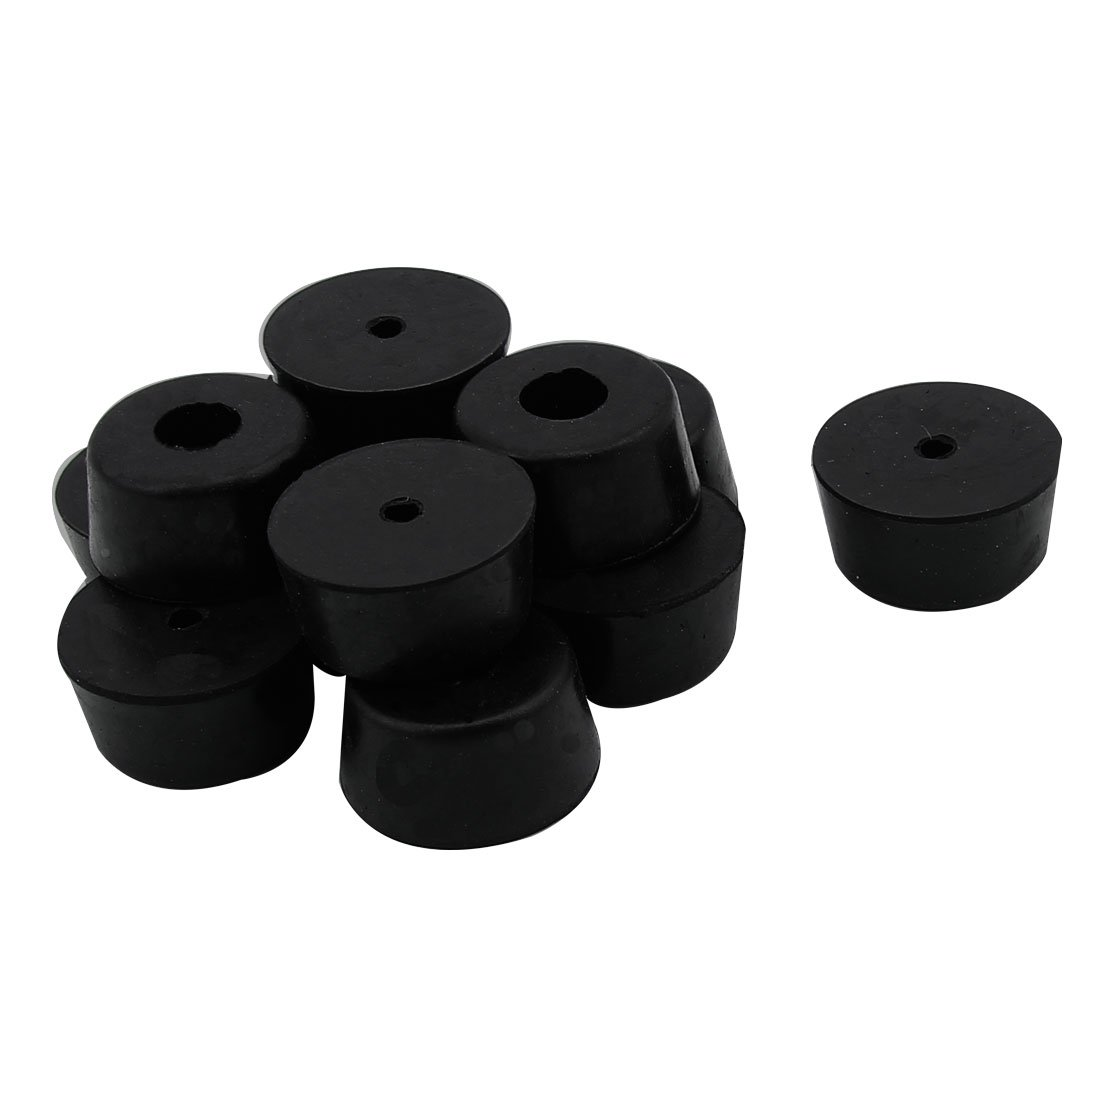 sourcingmap® Gummi Lautsprecher Möbel Stuhl Füße Pad 25mm x 22mm x ...